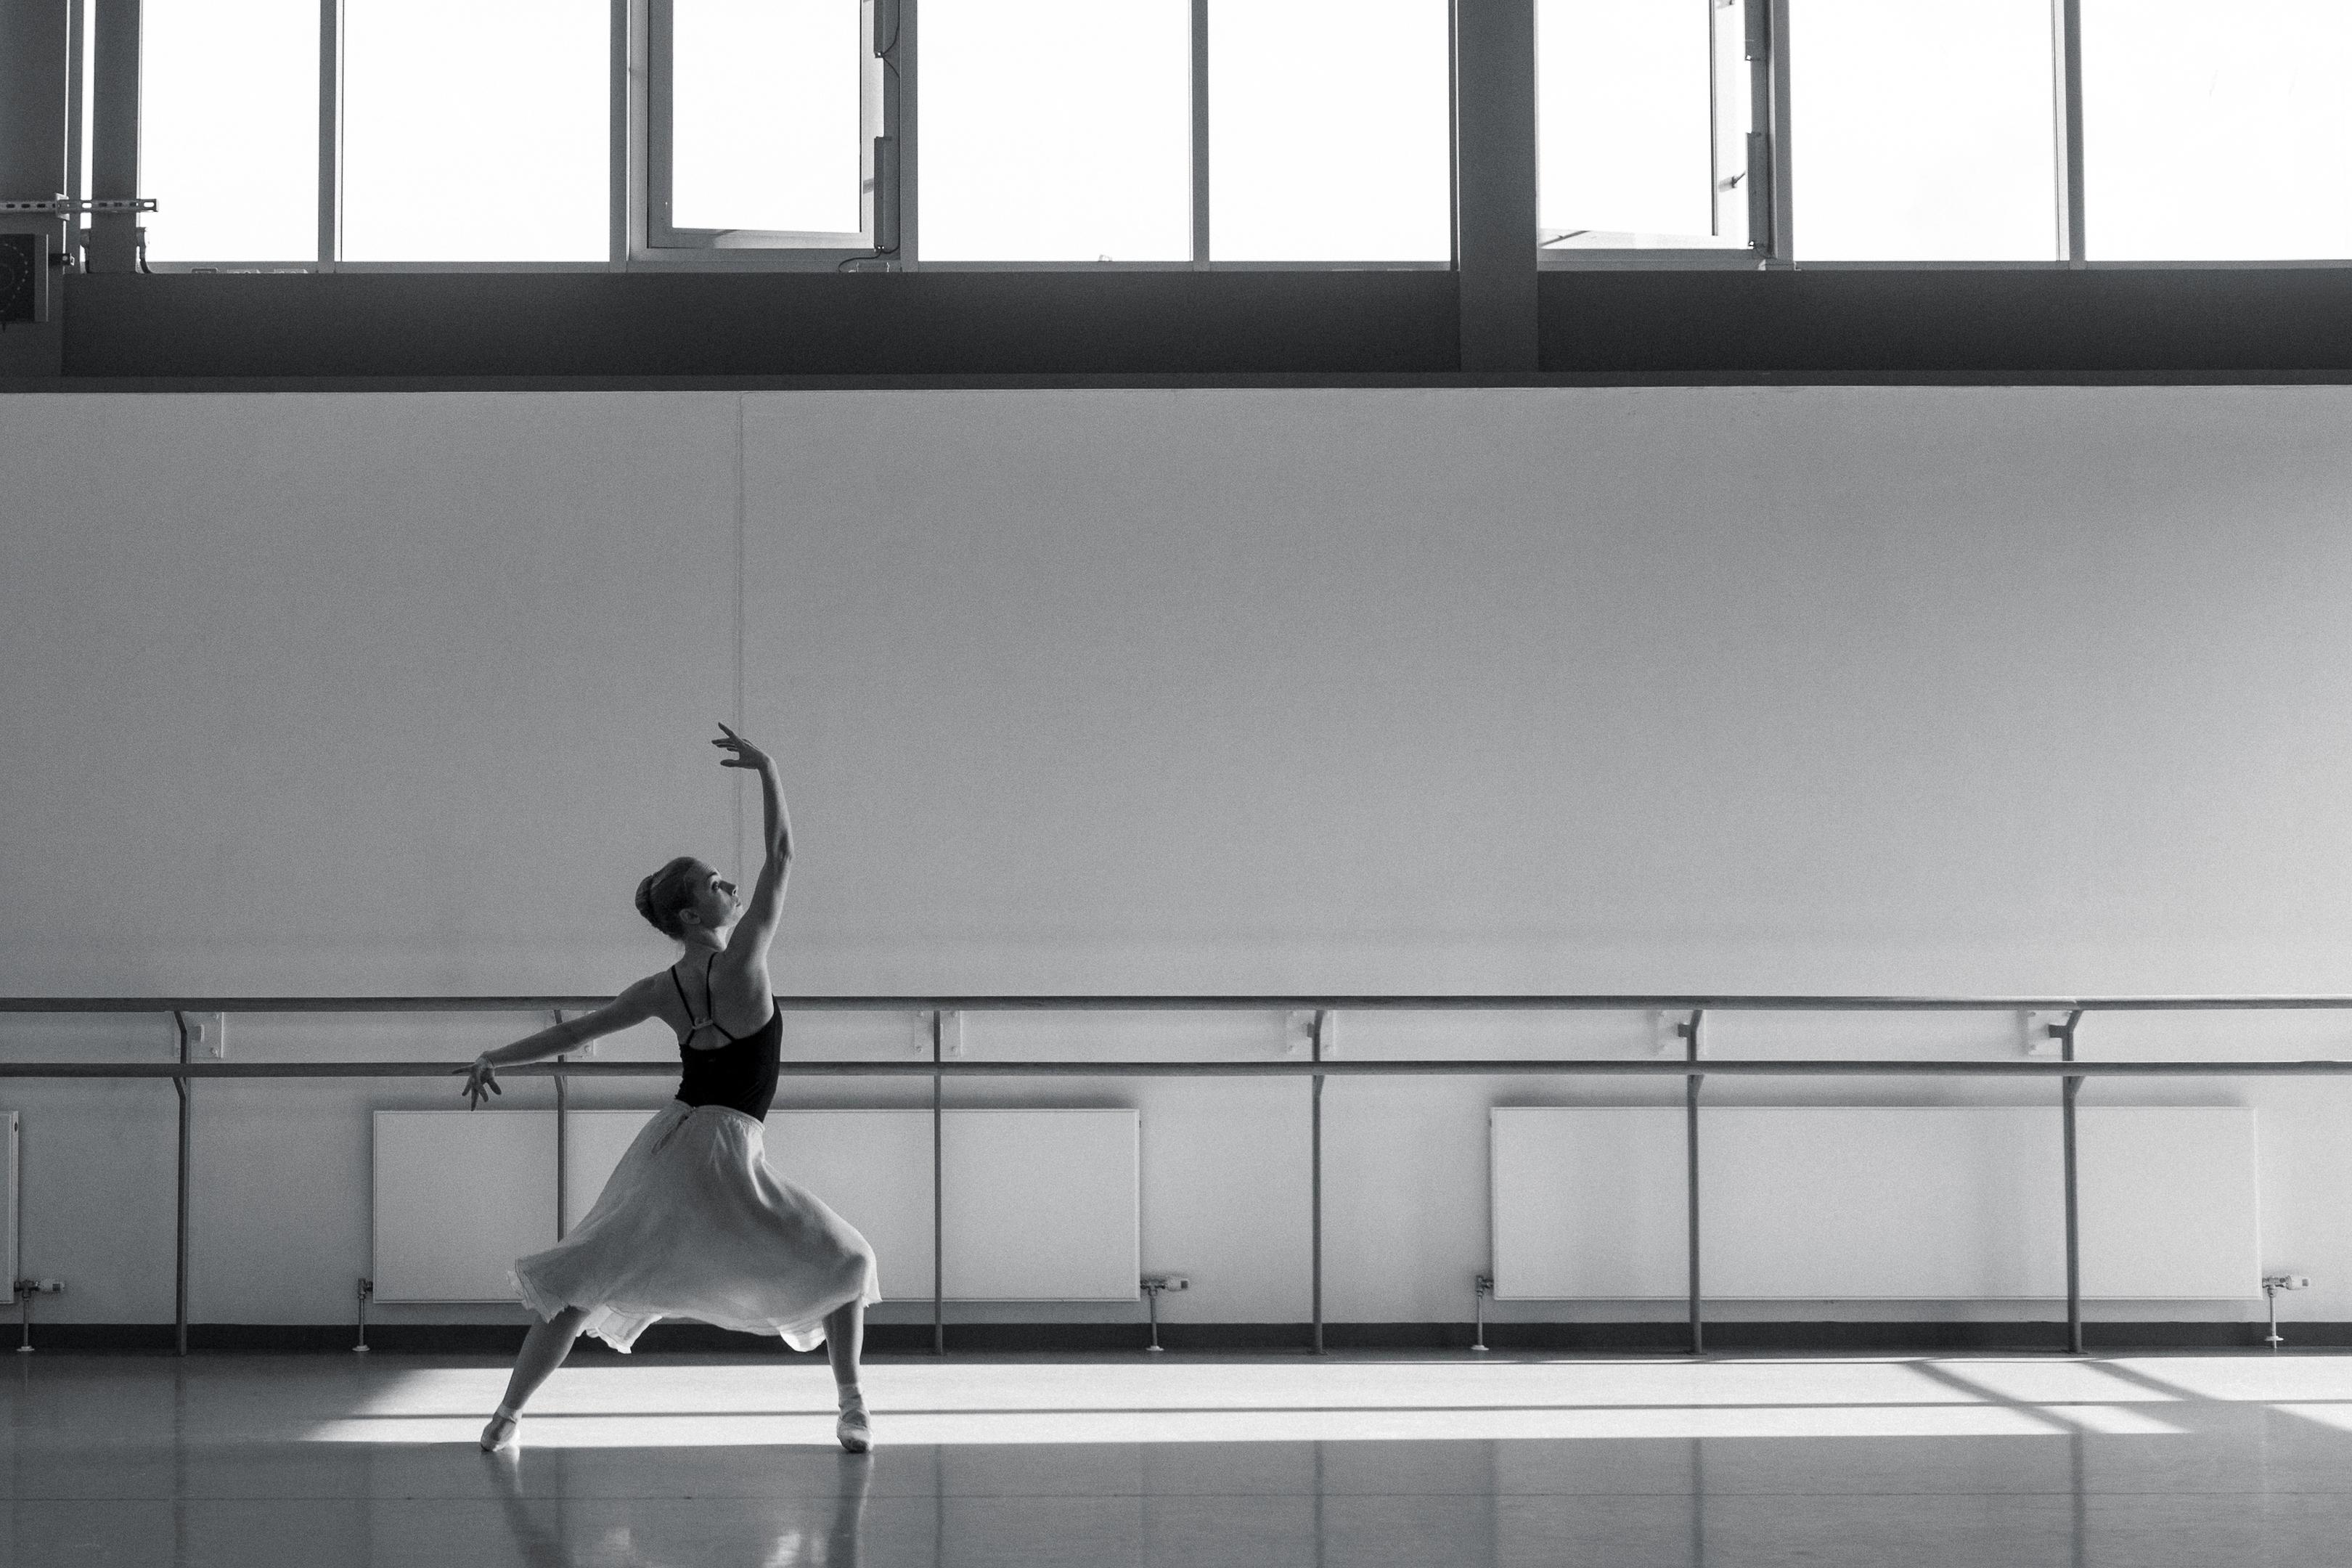 _MG_6823 – Bethany Kingsley-Garner in rehearsals for David Dawson's Swan Lake. Photo by Christina Riley.